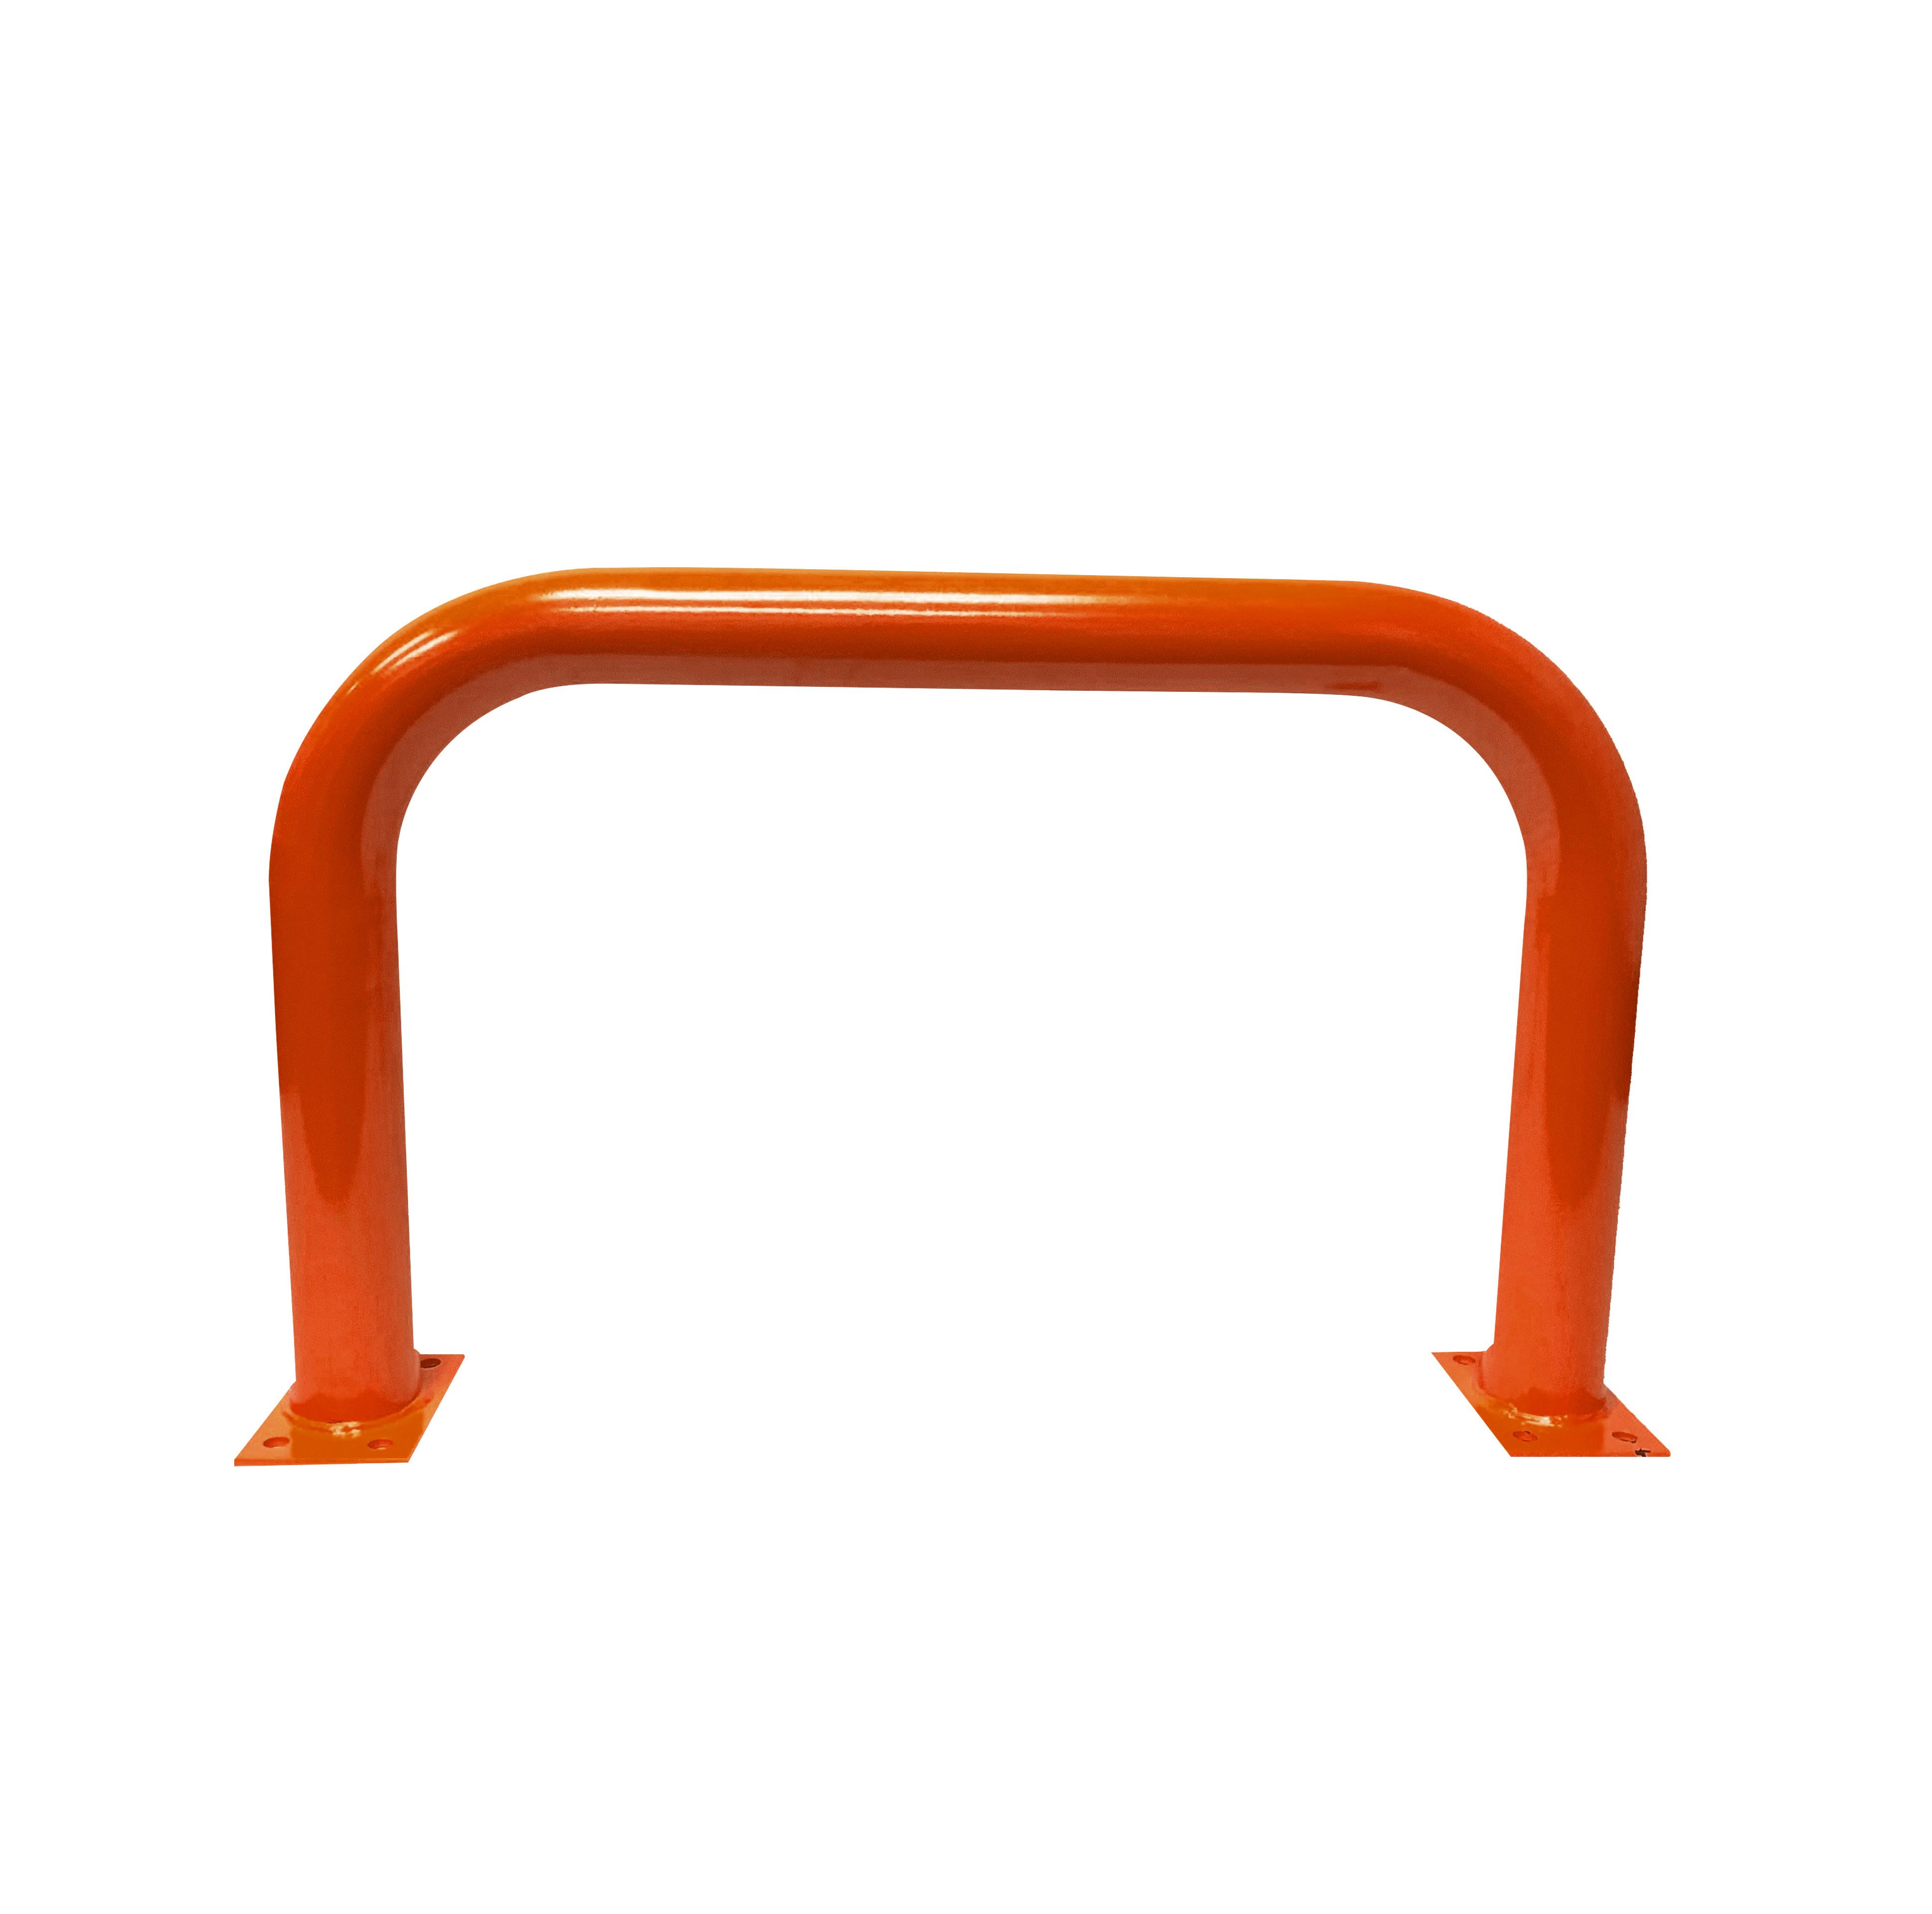 Barrier Protector - 500mm High x 900mm Wide - 76mm Tube Orange